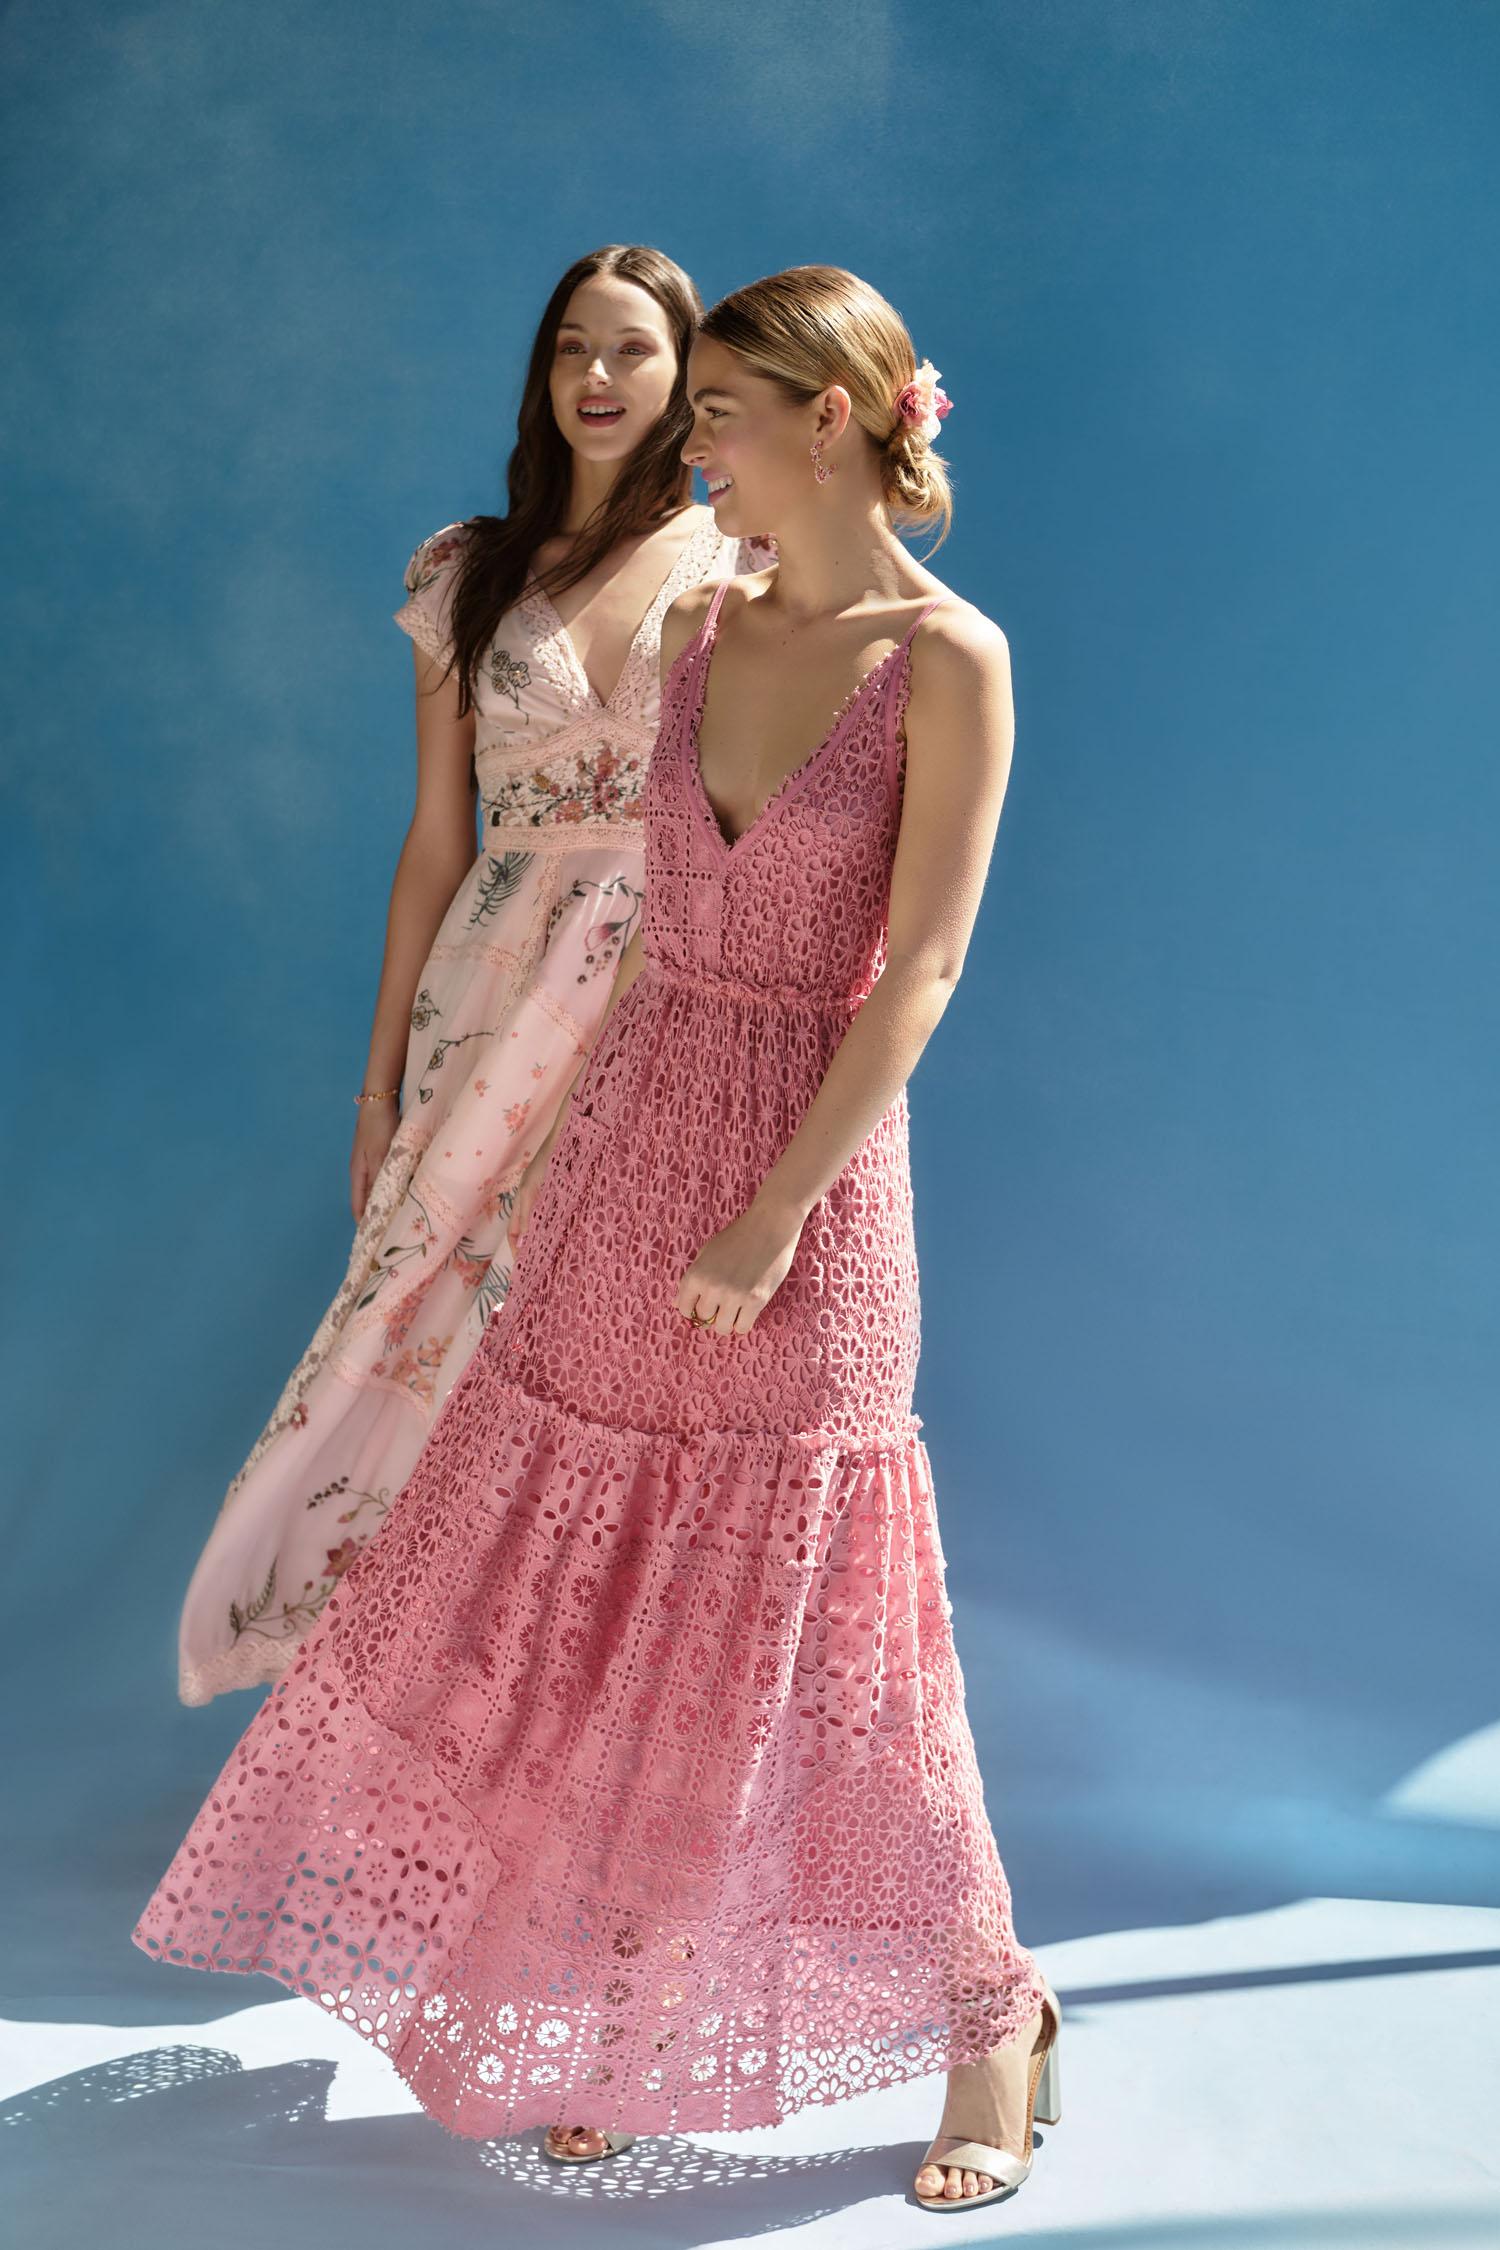 pink and floral print bridesmaids dresses